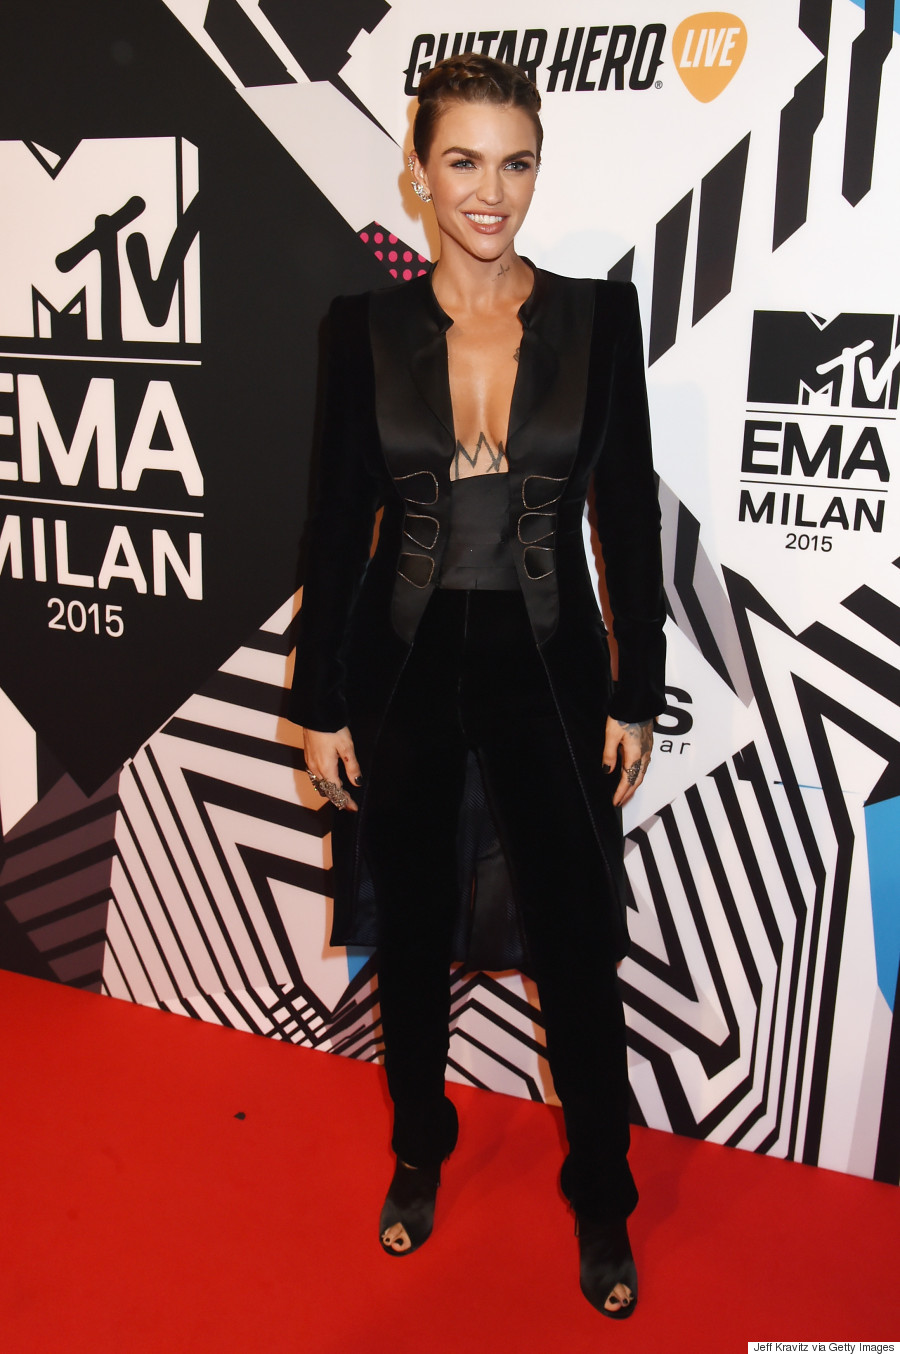 Ruby Rose Slayed the MTV EMAs RedCarpet